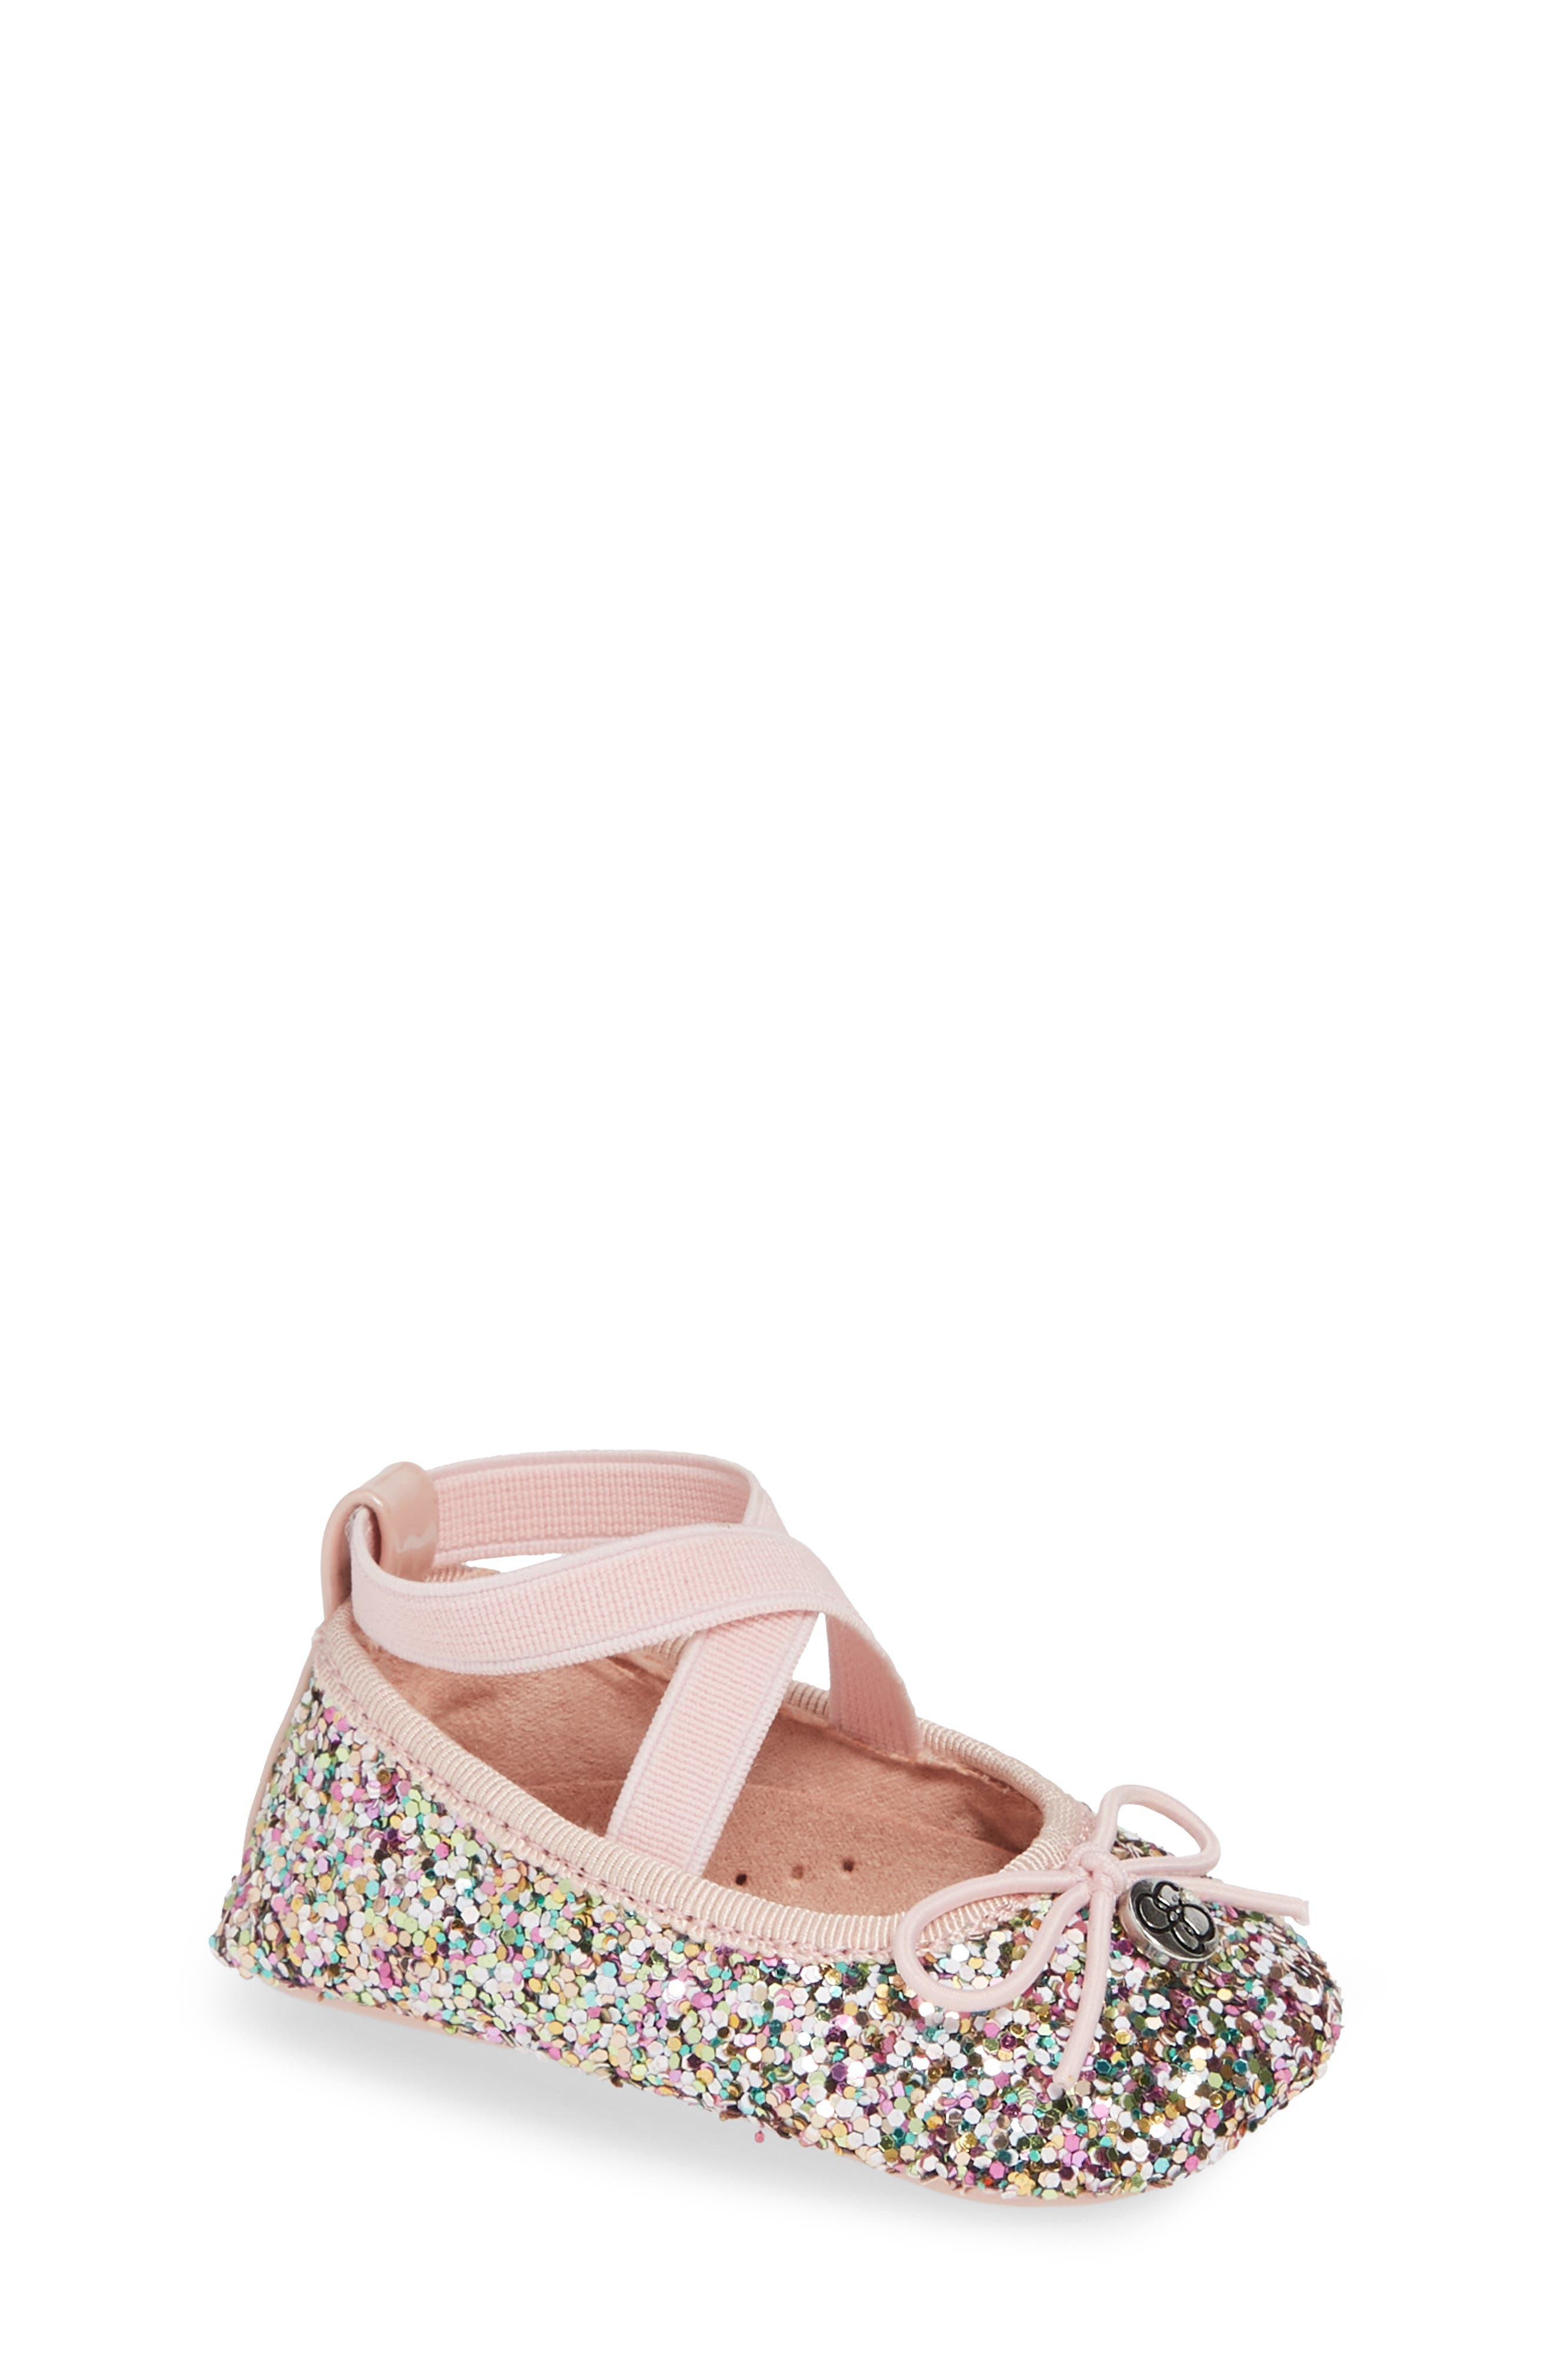 JESSICA SIMPSON, Glitter Mary Jane Crib Shoe, Main thumbnail 1, color, 650